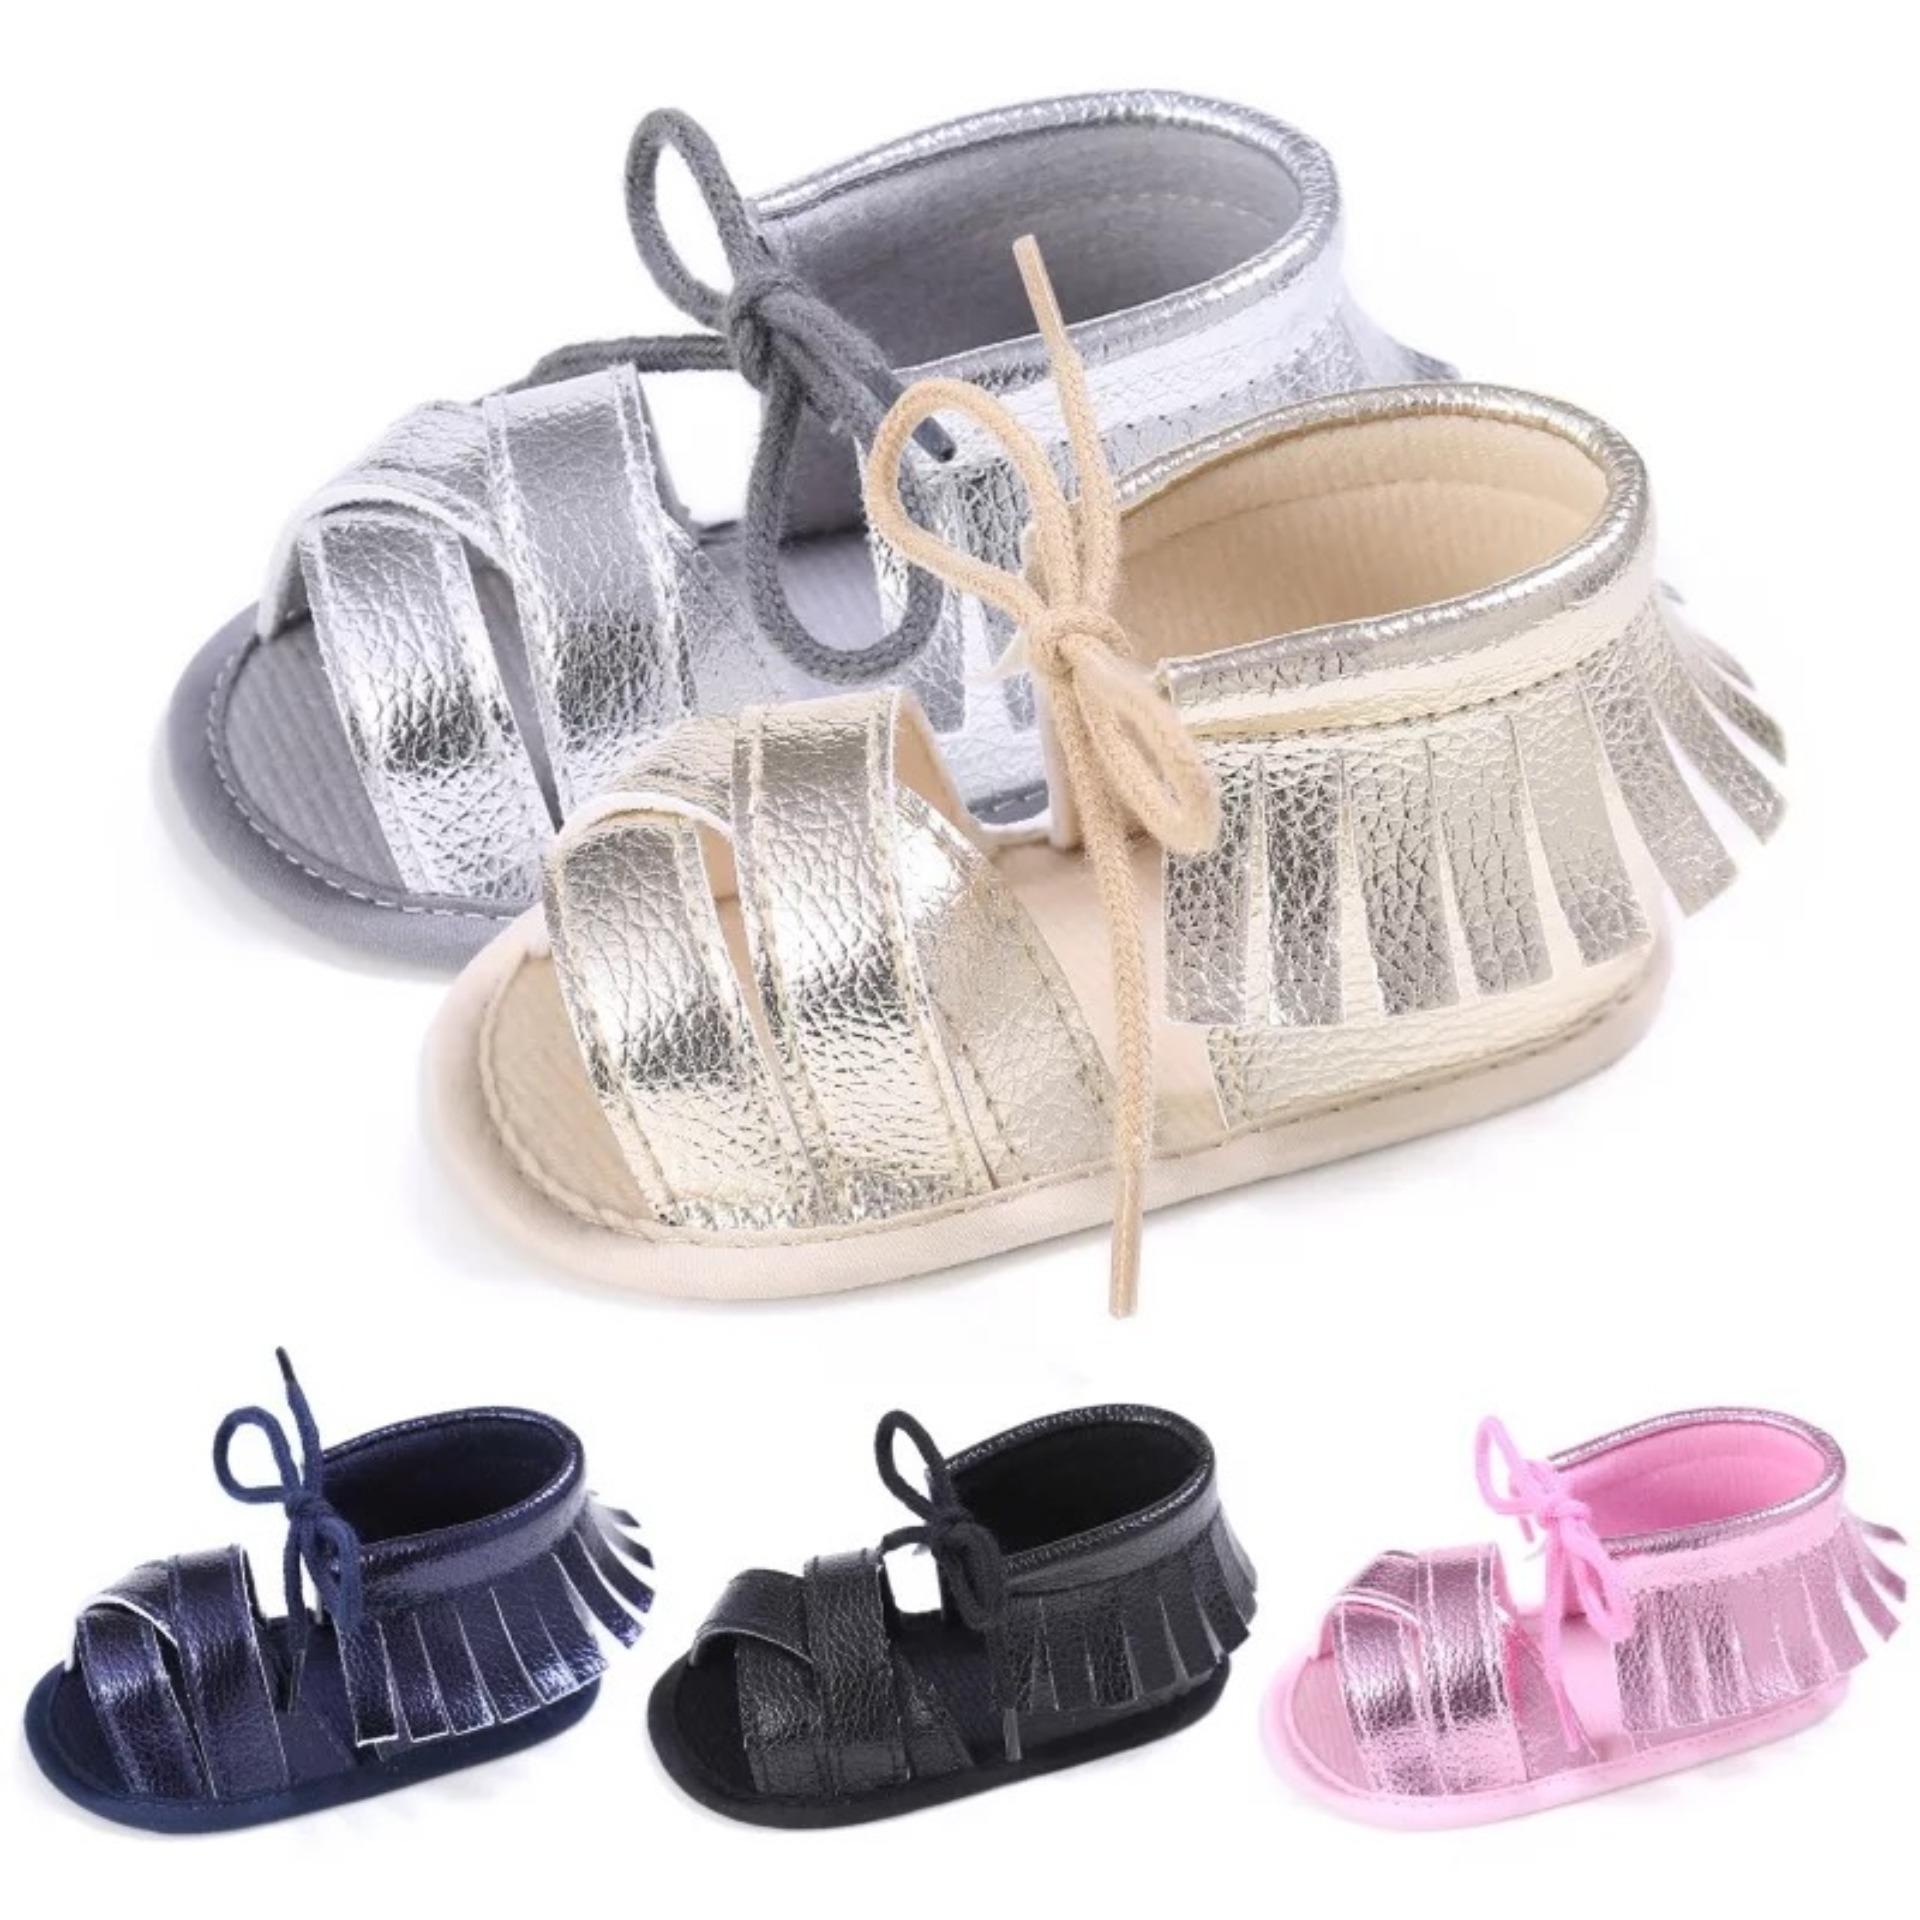 Sandal tập đi tua rua bé gái